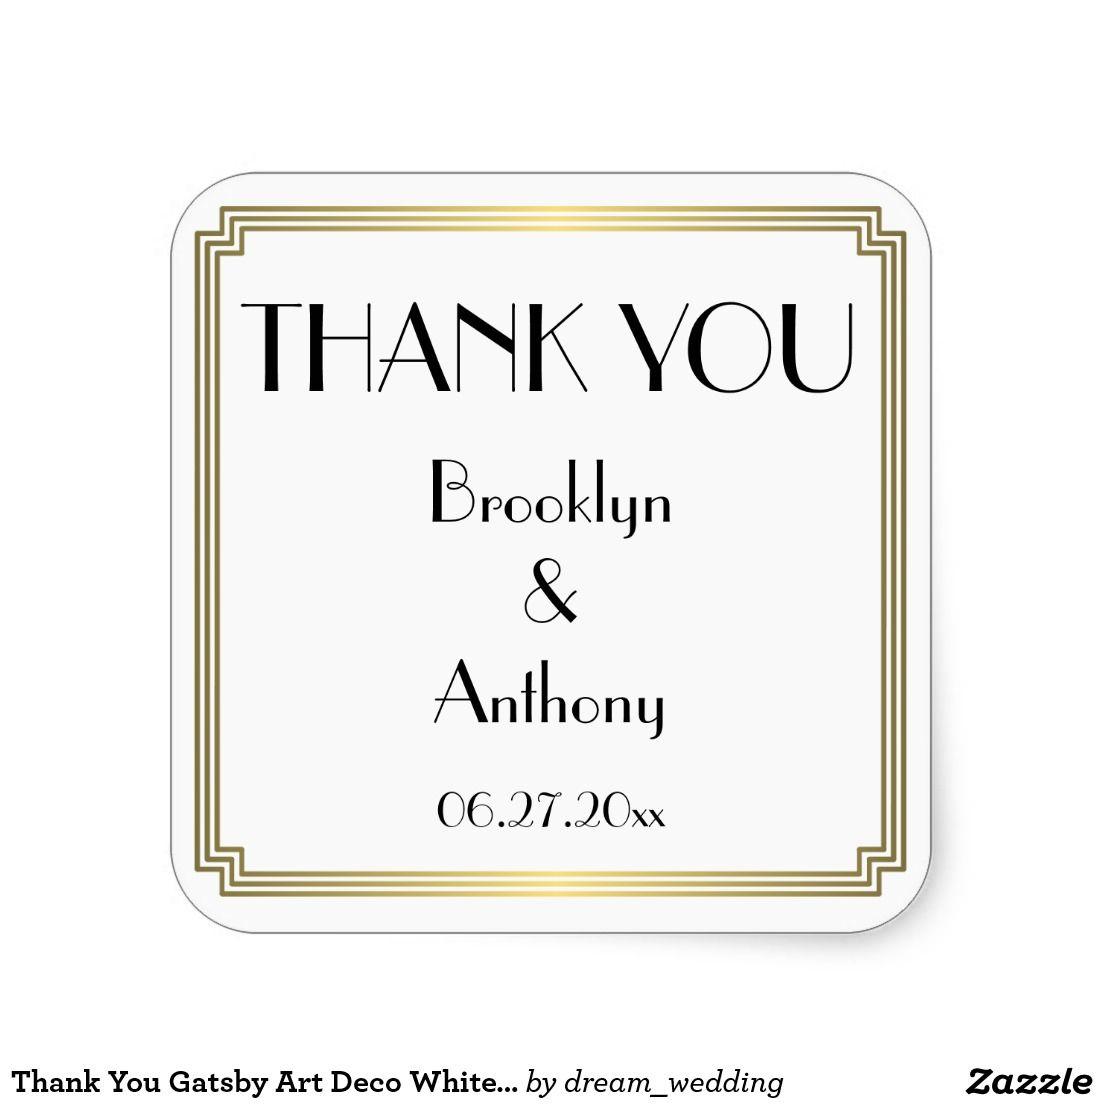 Thank You Gatsby Art Deco White Wedding Stickers | Art Deco Great ...